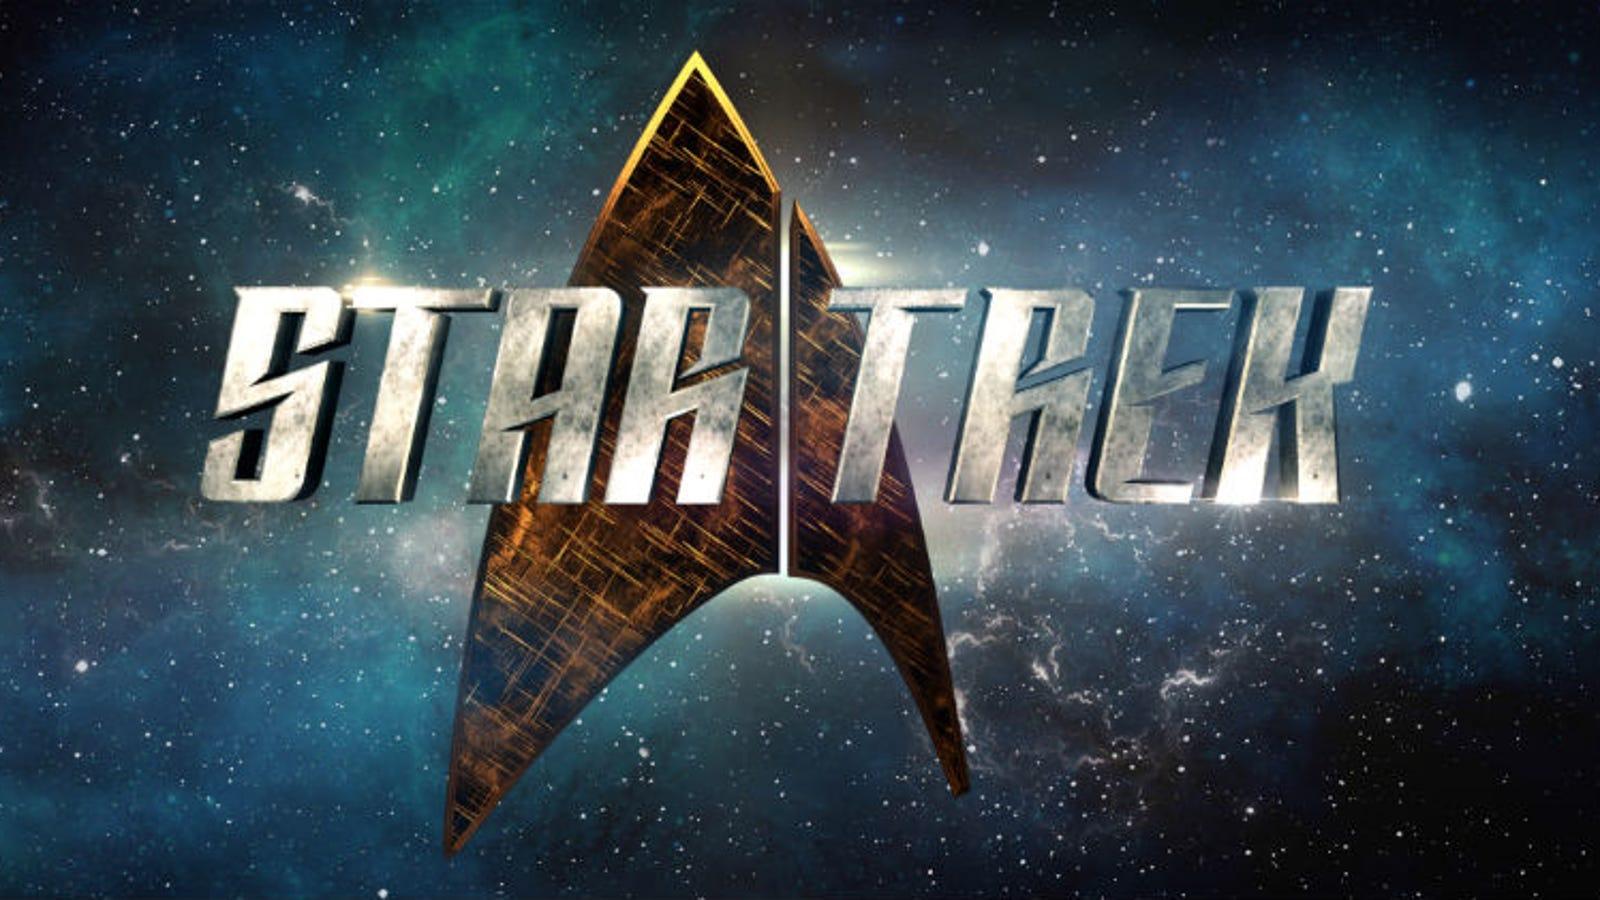 The Star Trek TV Teaser Promises New Crews, Villains, Heroes, and Worlds